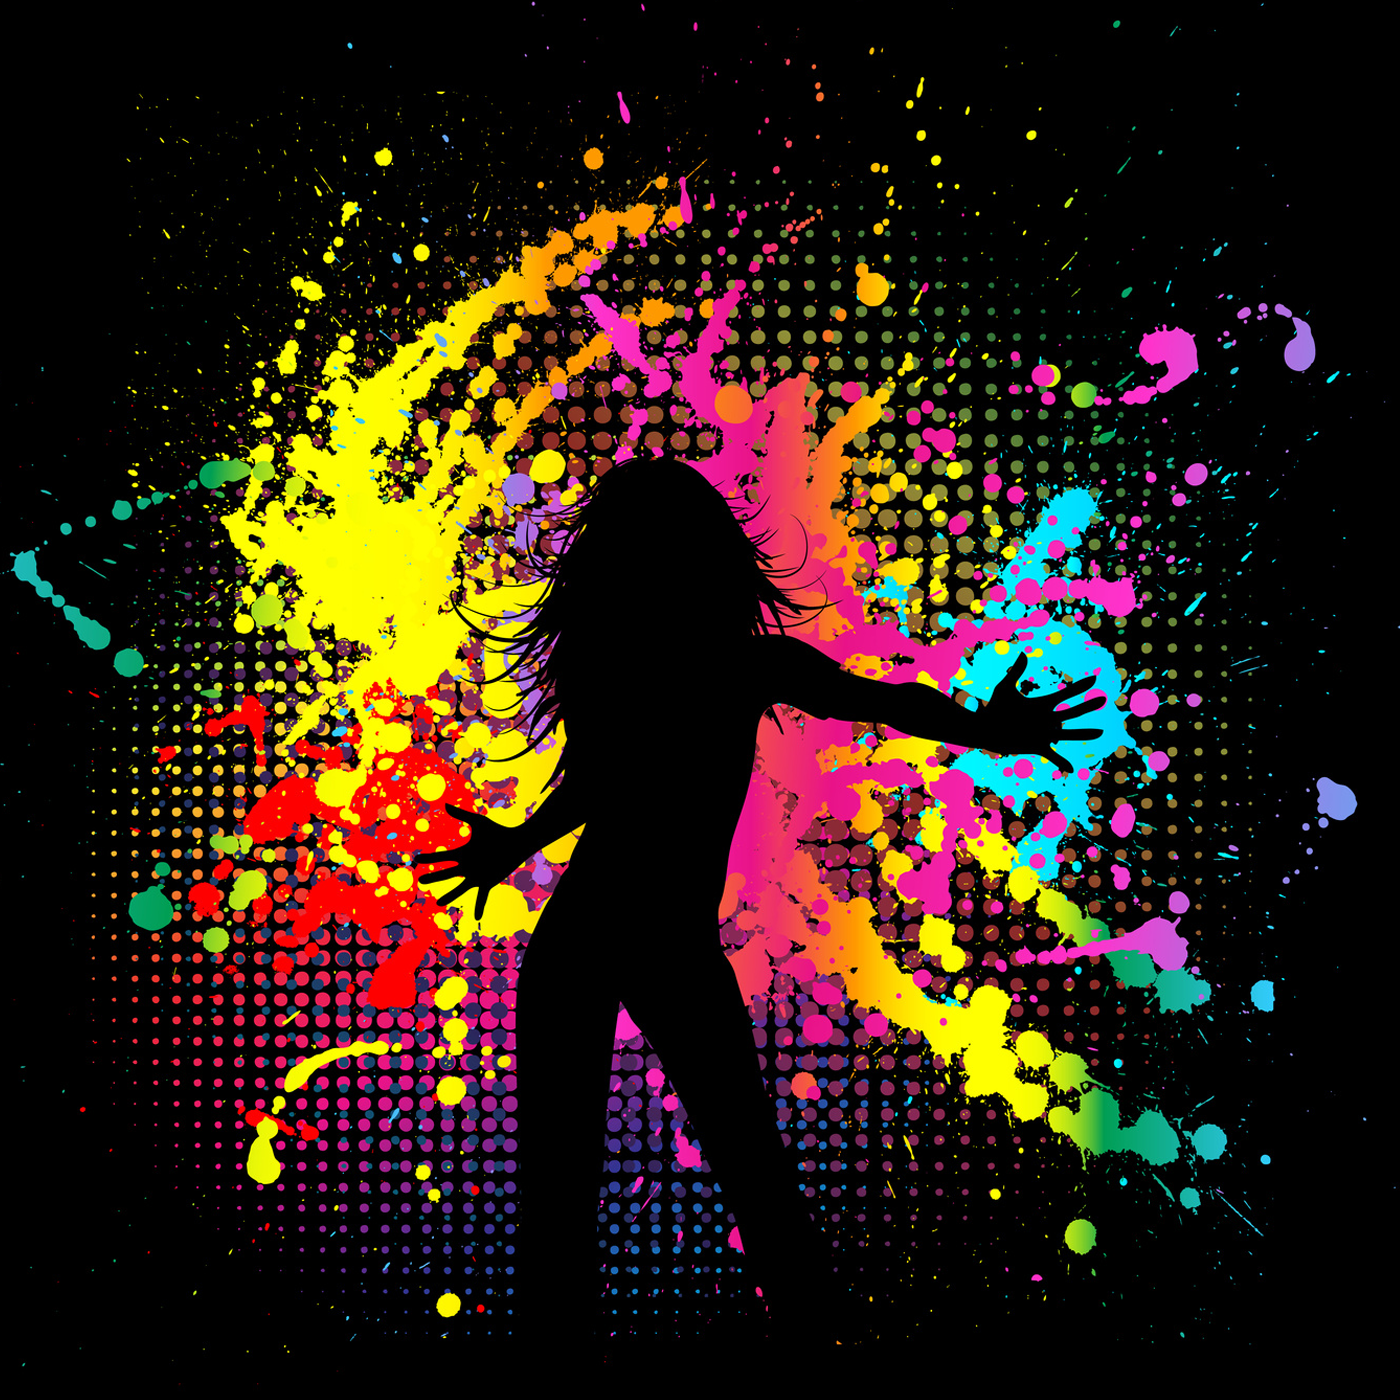 Dance hits on radiotunes radiotunes enjoy amazing free for 90s house music hits